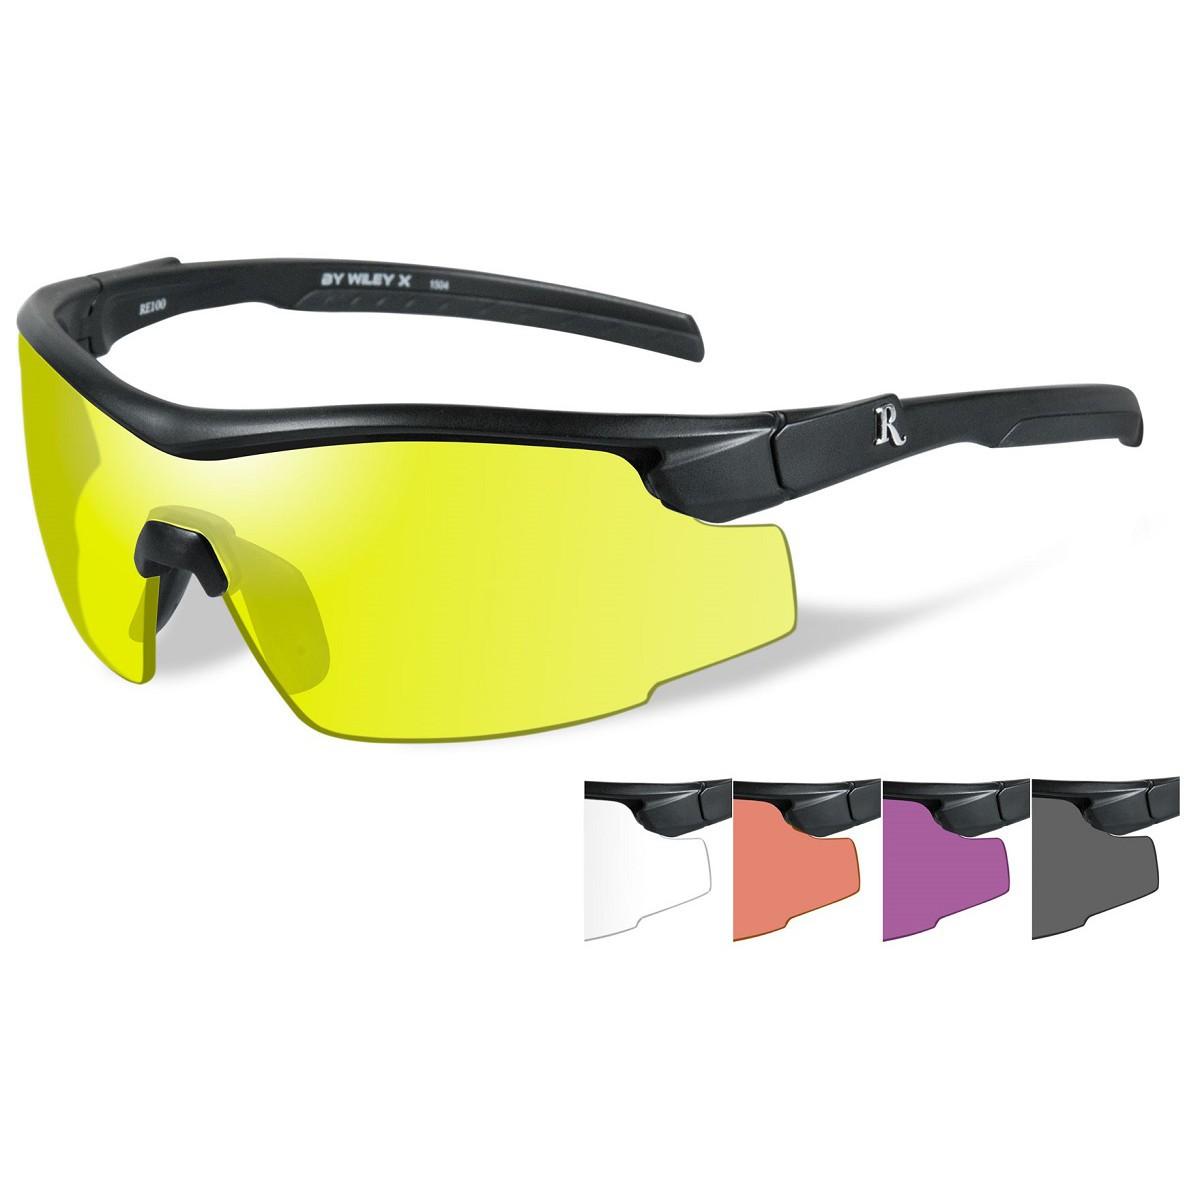 Eyeglass Frames With Interchangeable Lenses : Remington RE105 Shooting Glasses Kit - Black Frame - Five ...